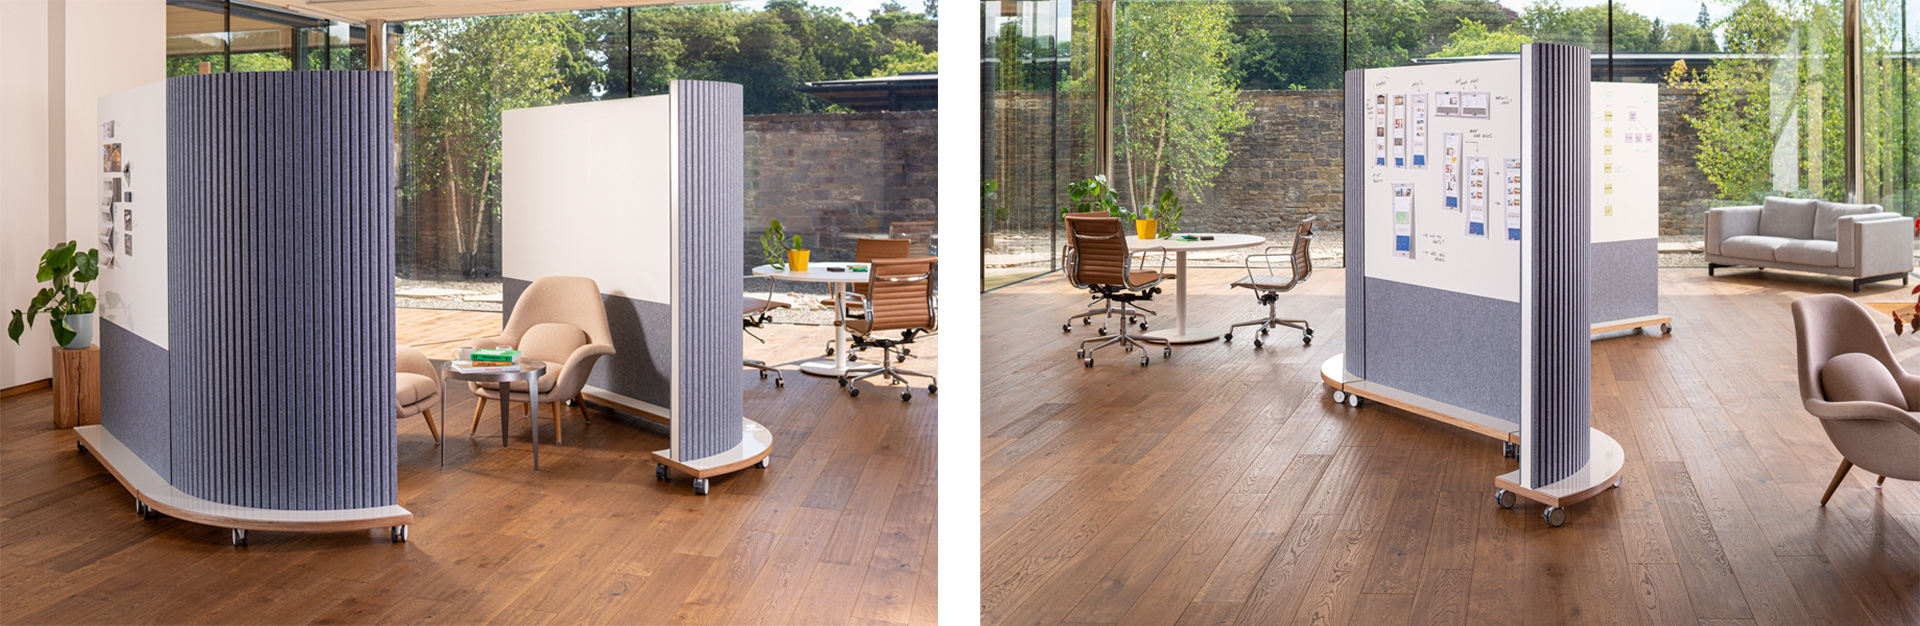 Workspace Collaboration Furniture